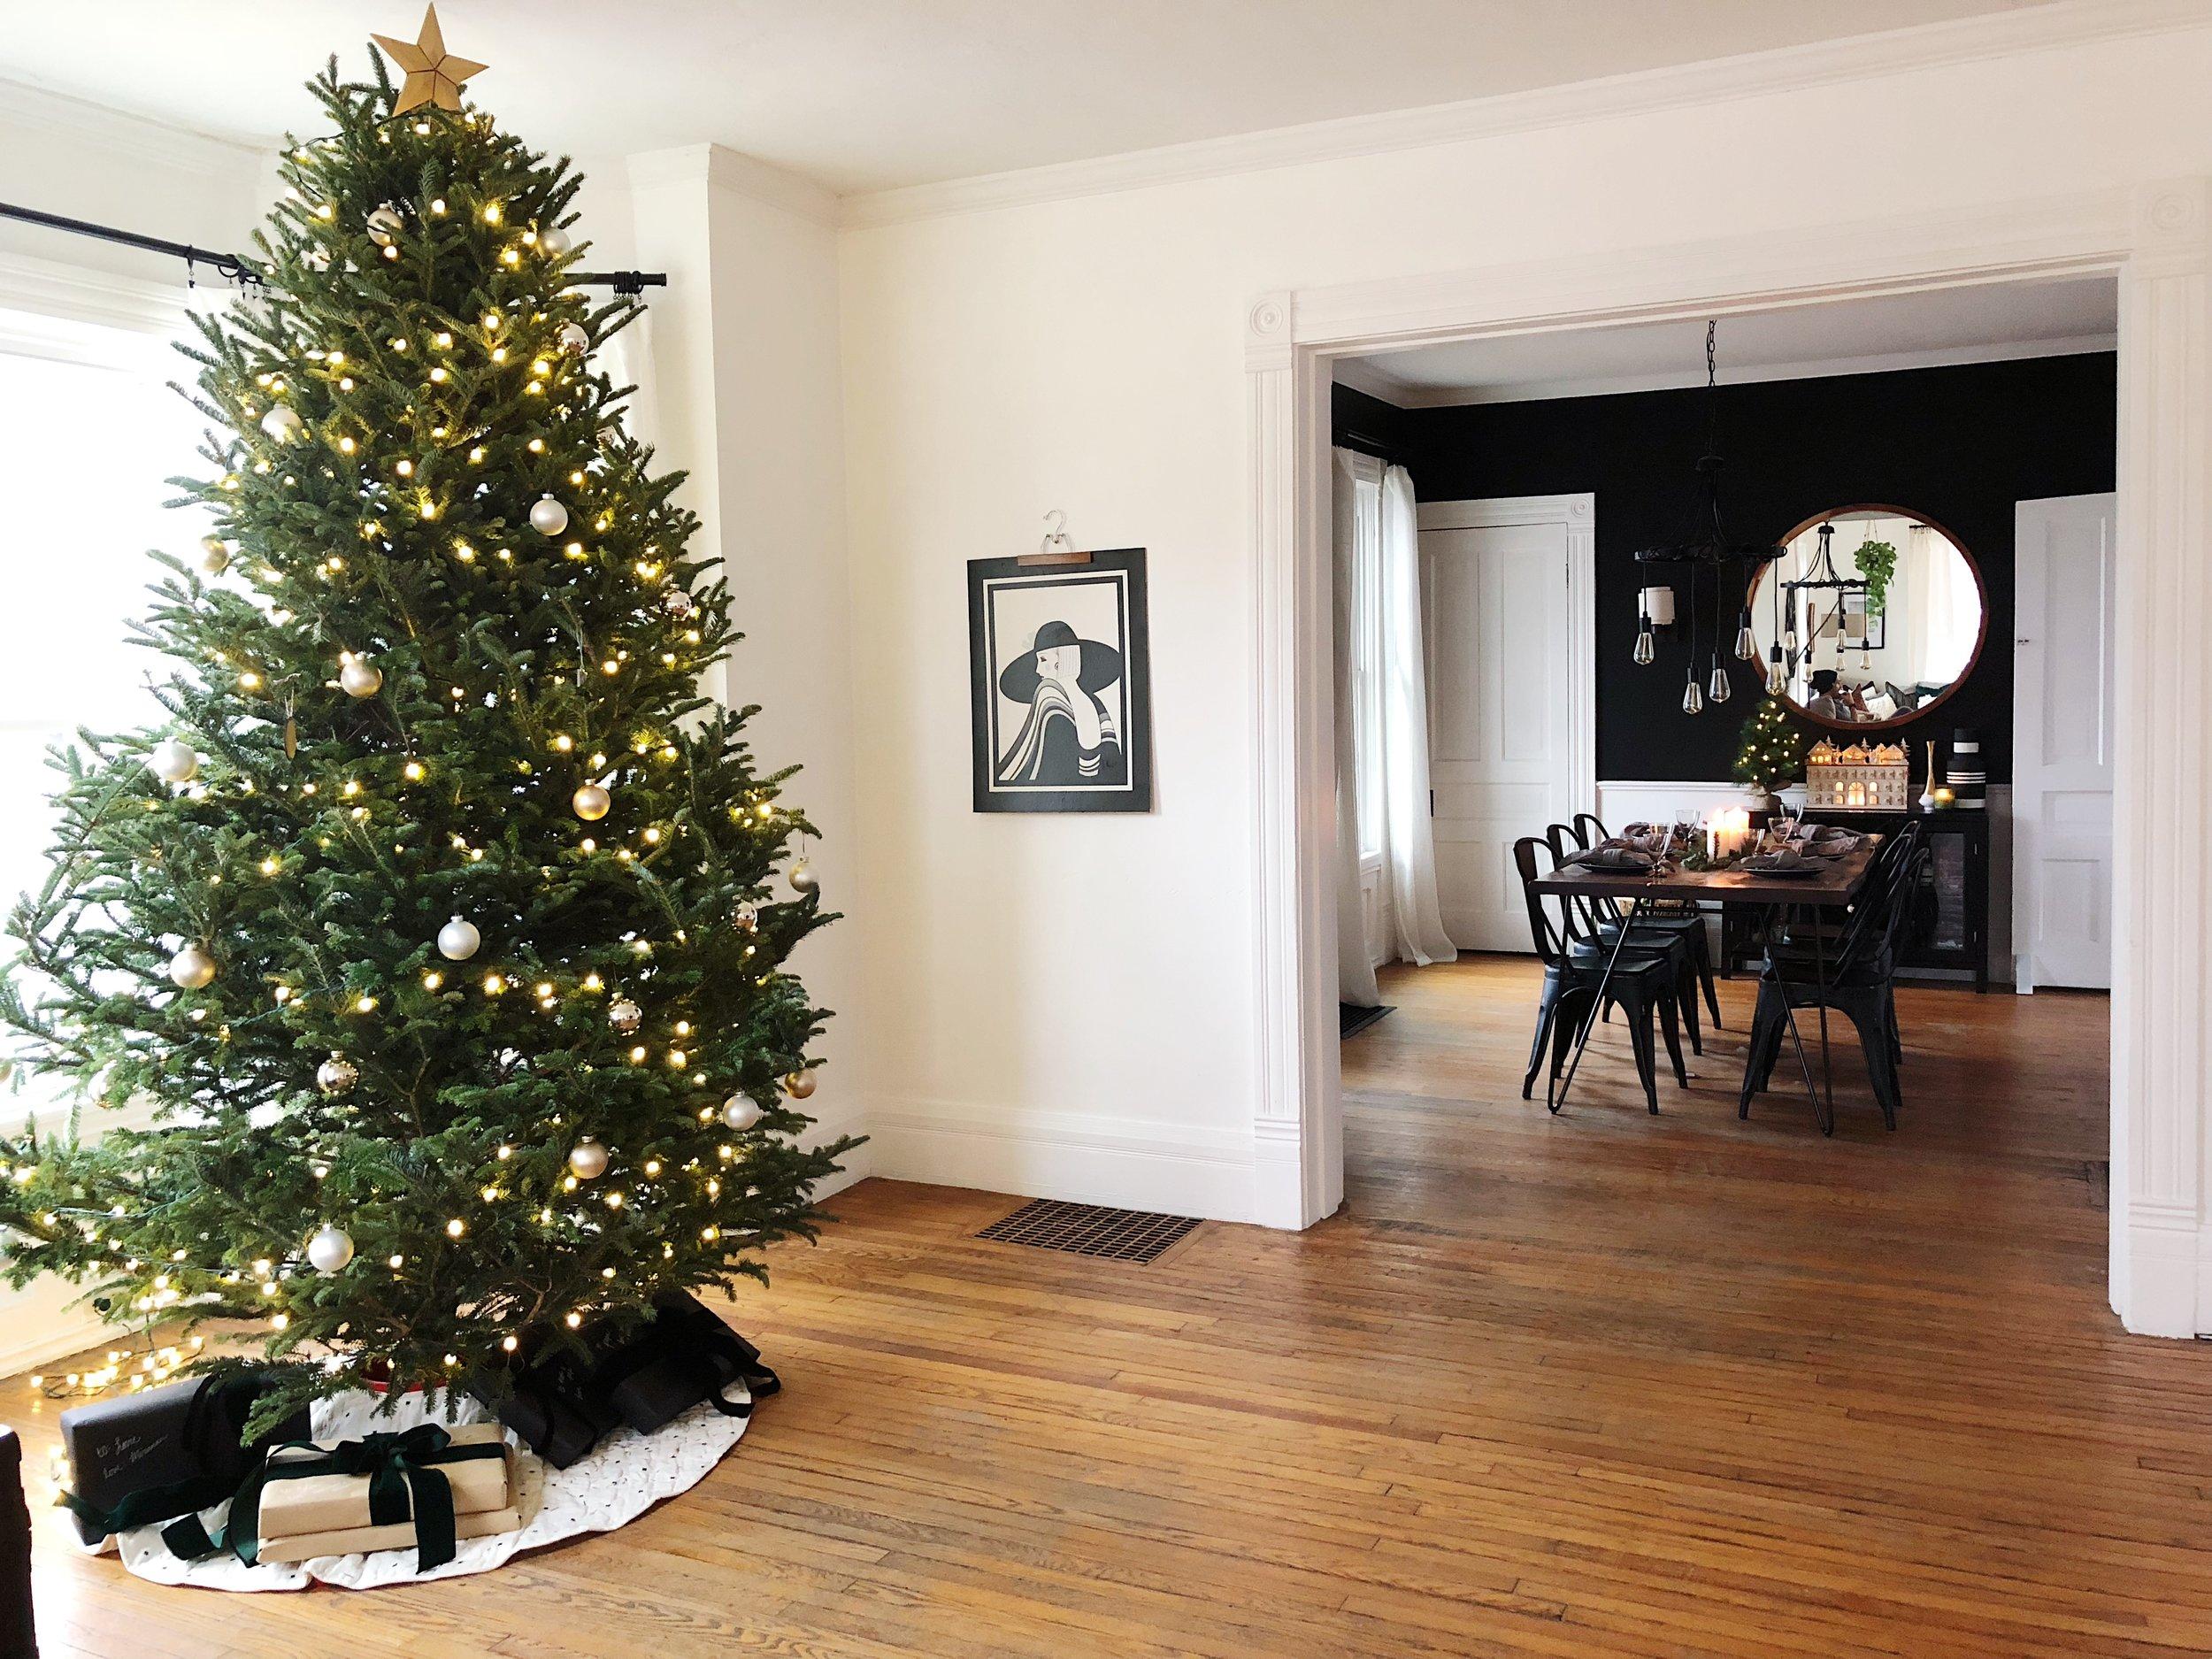 Black and White Christmas Decor Neutral Christmas Decor Live Tree